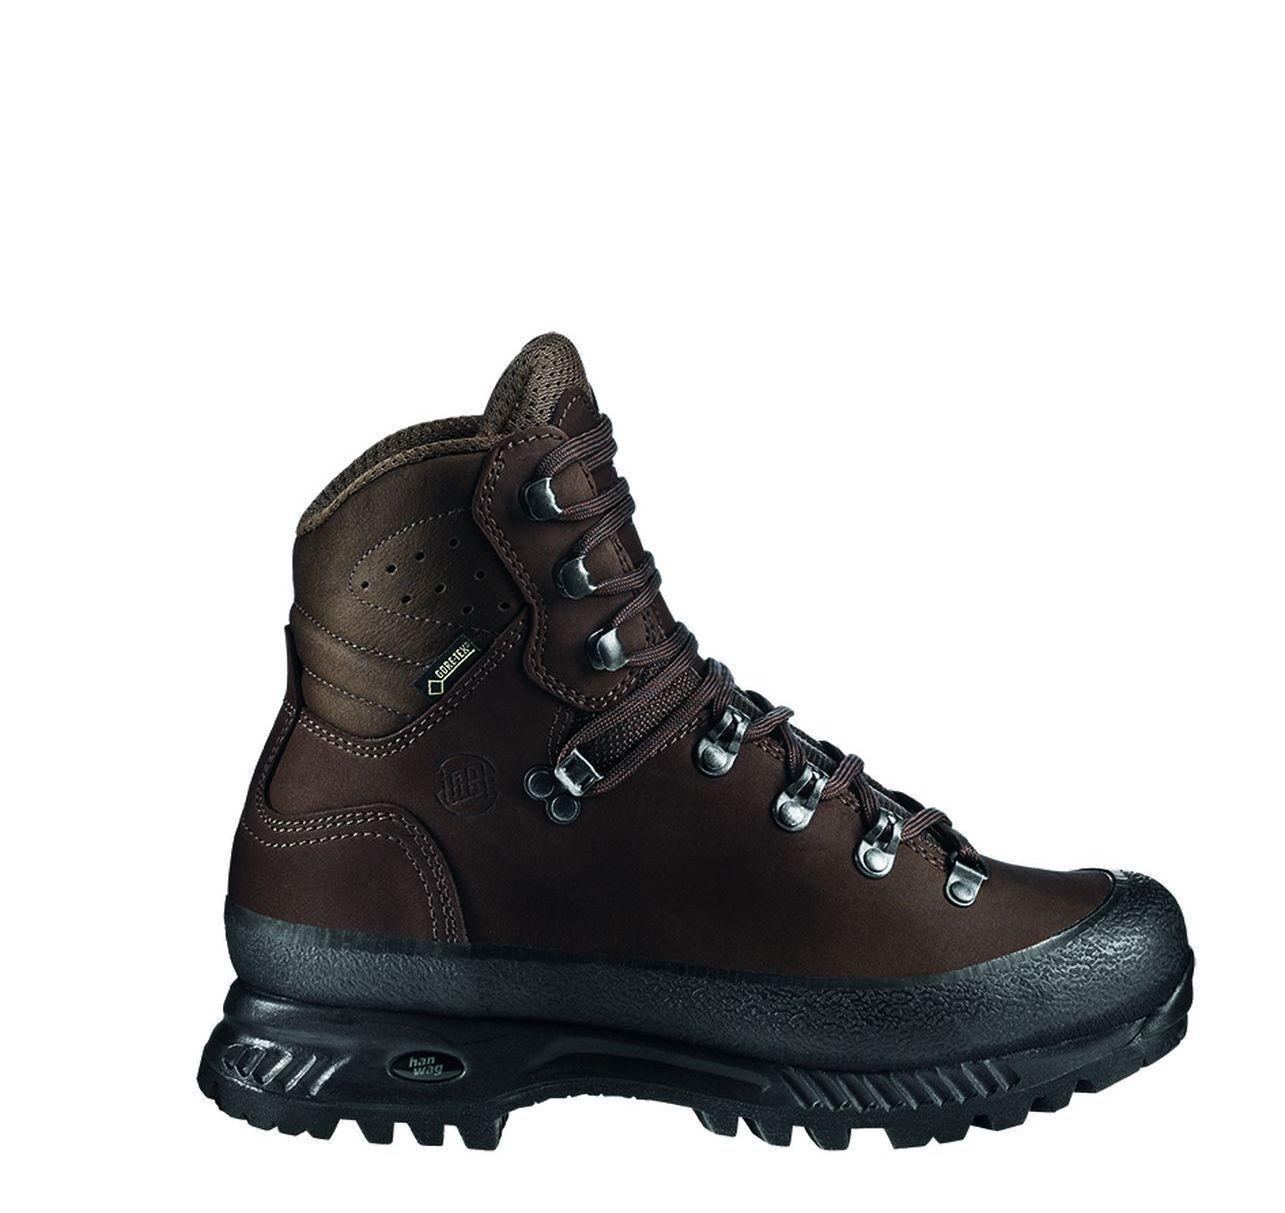 Hanwag Mountain shoes nazcat GTX Men Size  11 - 46 Earth  novelty items